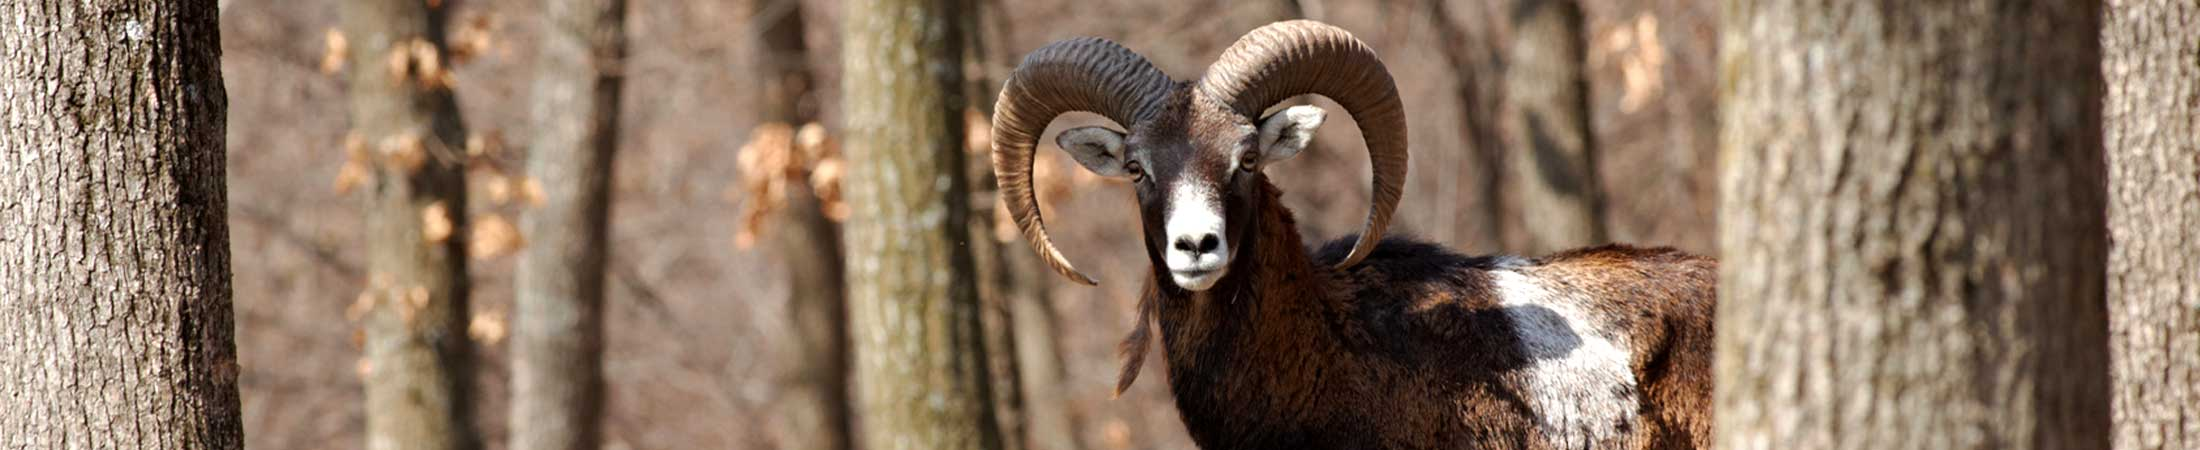 mouflon450